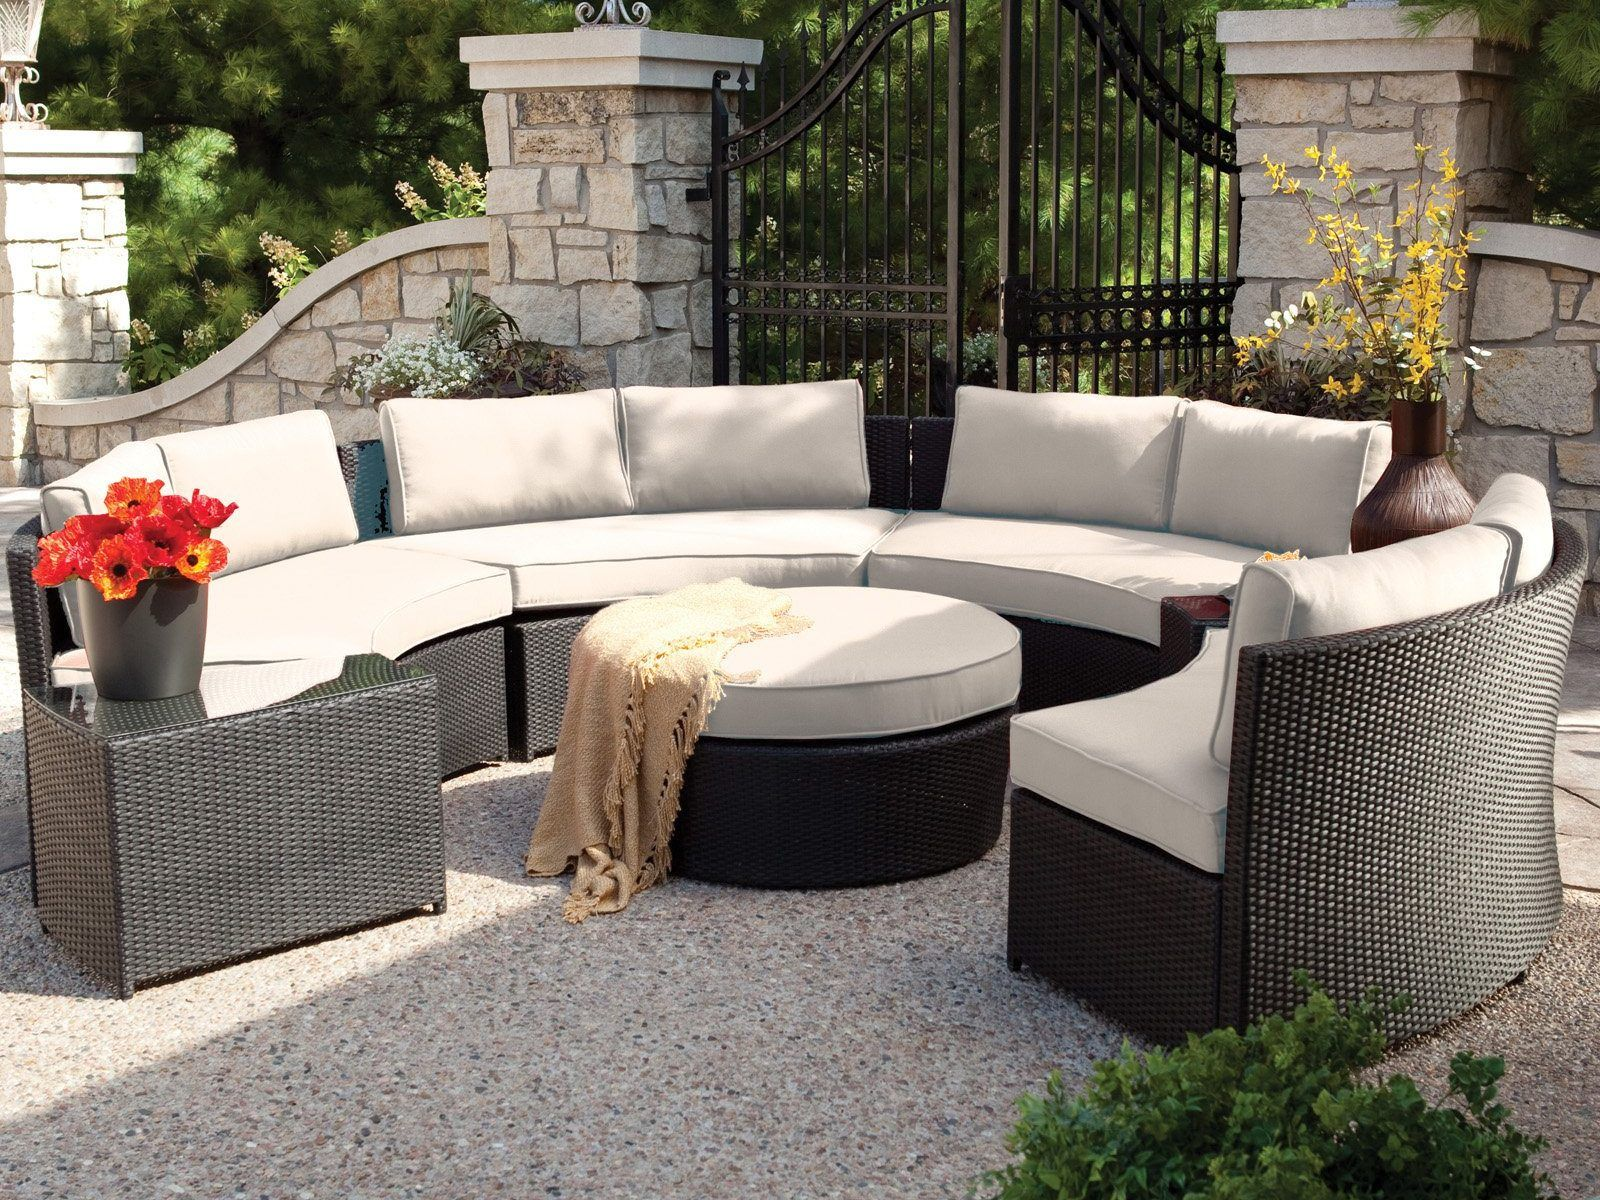 Cheap Outdoor Patio Furniture Sets Patio Ideas Pinterest Patio